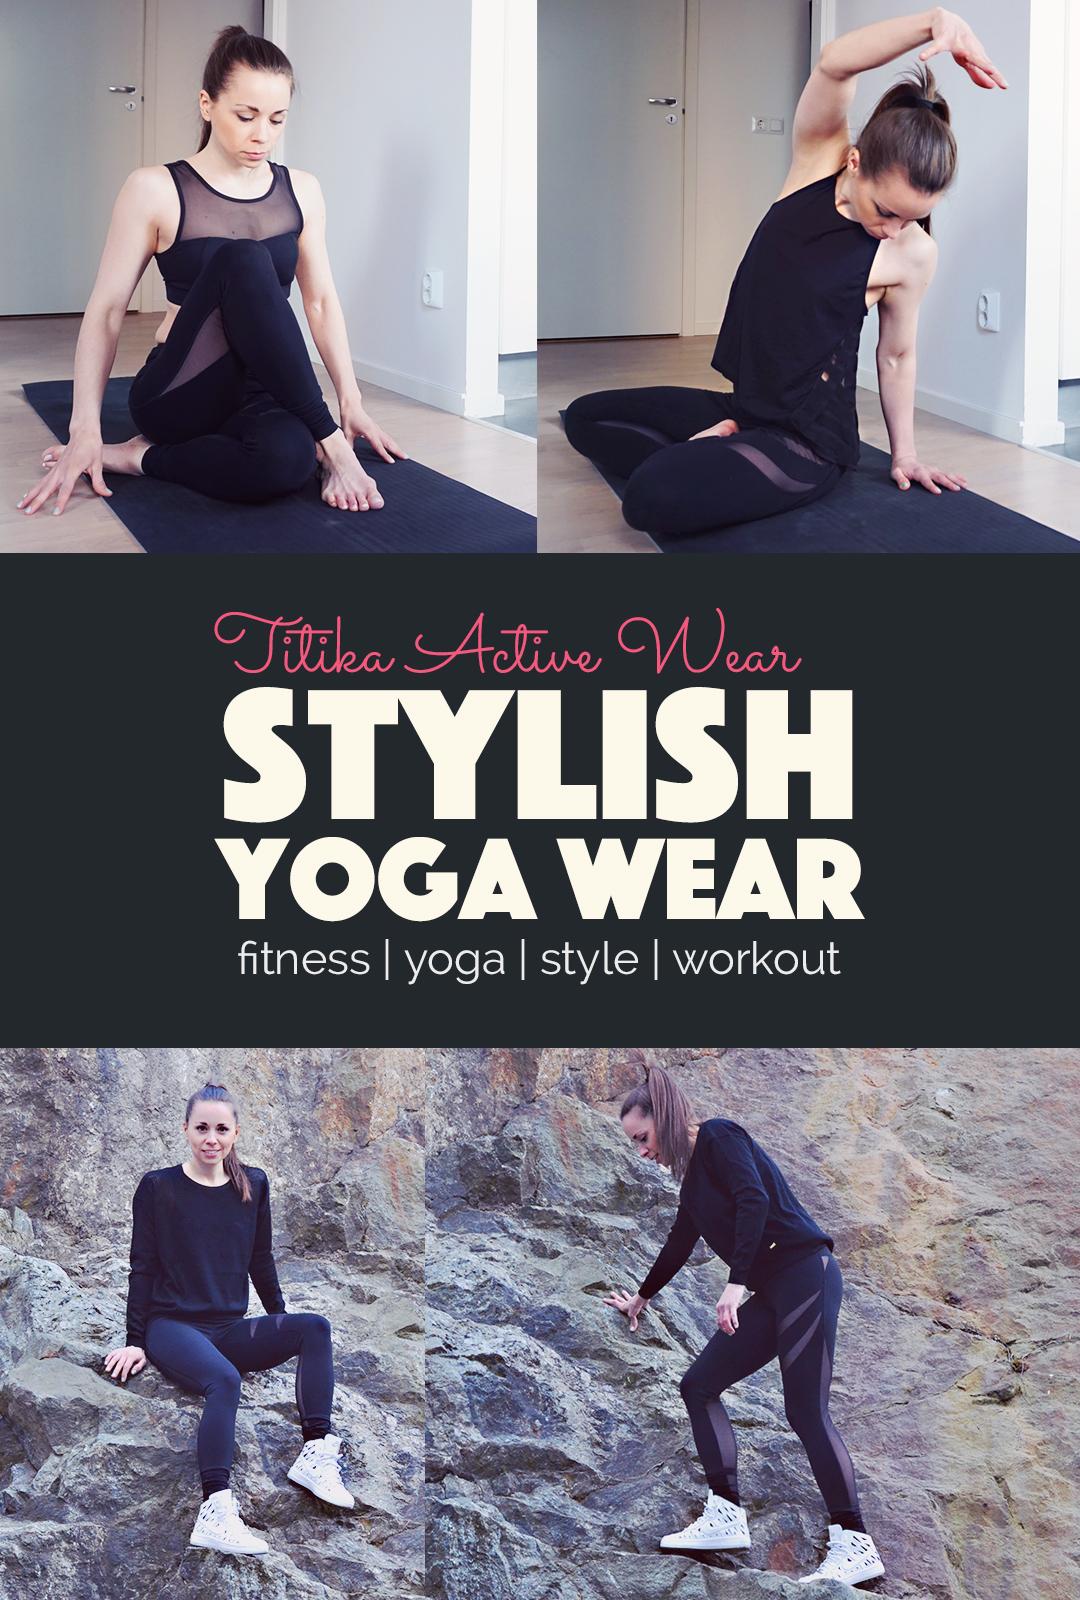 Stylish Yoga Gear |http://BananaBloom.com